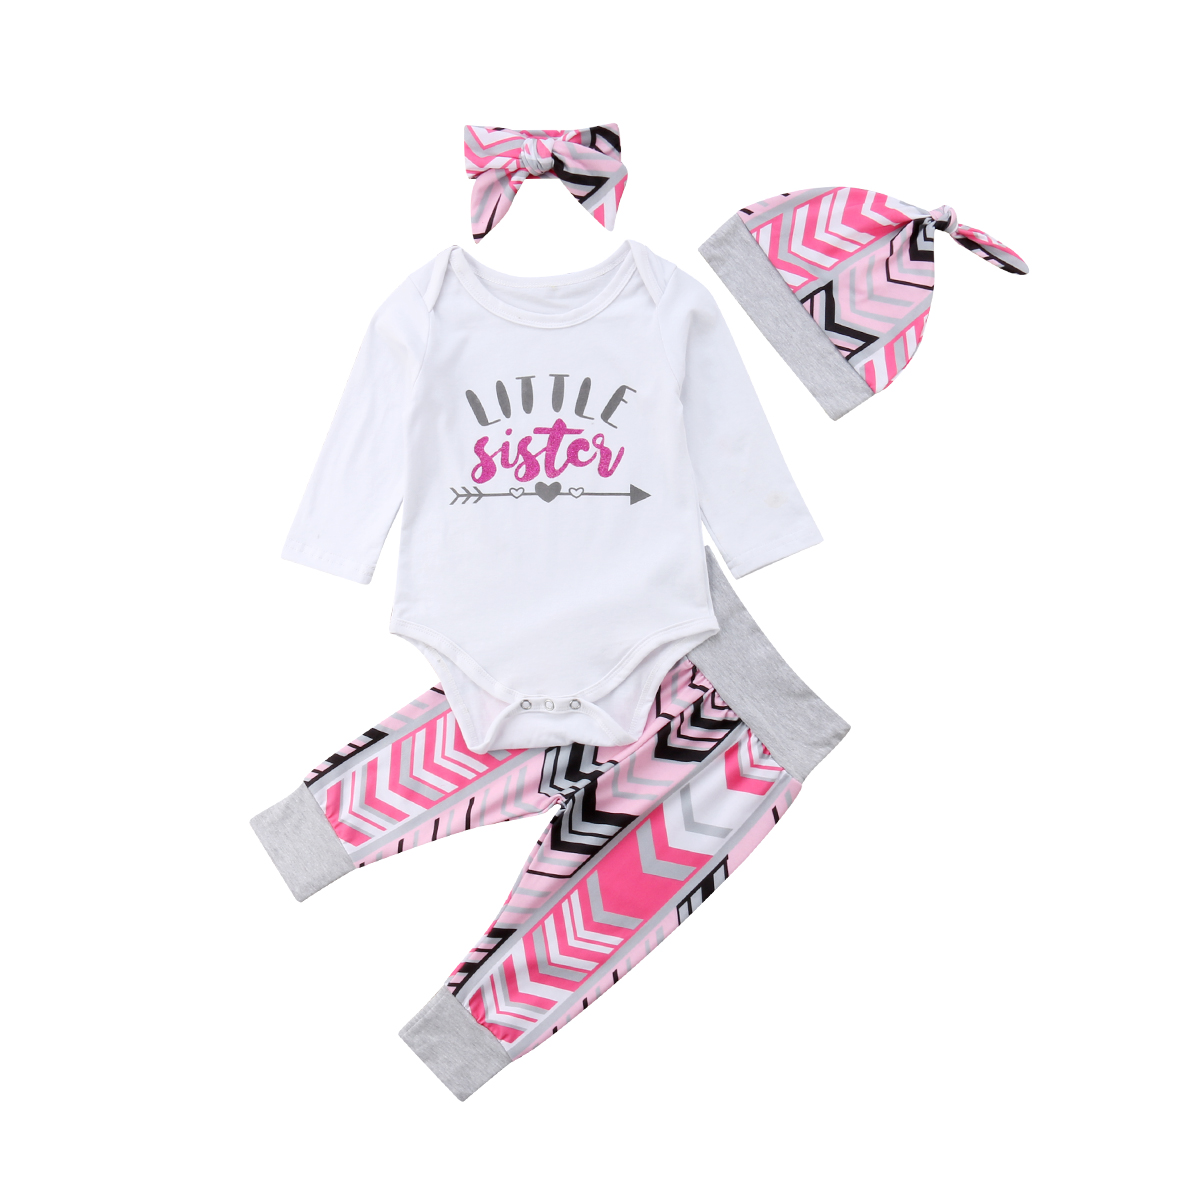 Newborn Baby Girl Clothing Little Sister Tops Bodysuits Long Pants Headbands Hats 4PCS Cotton Clothes Baby Girl 0-24M